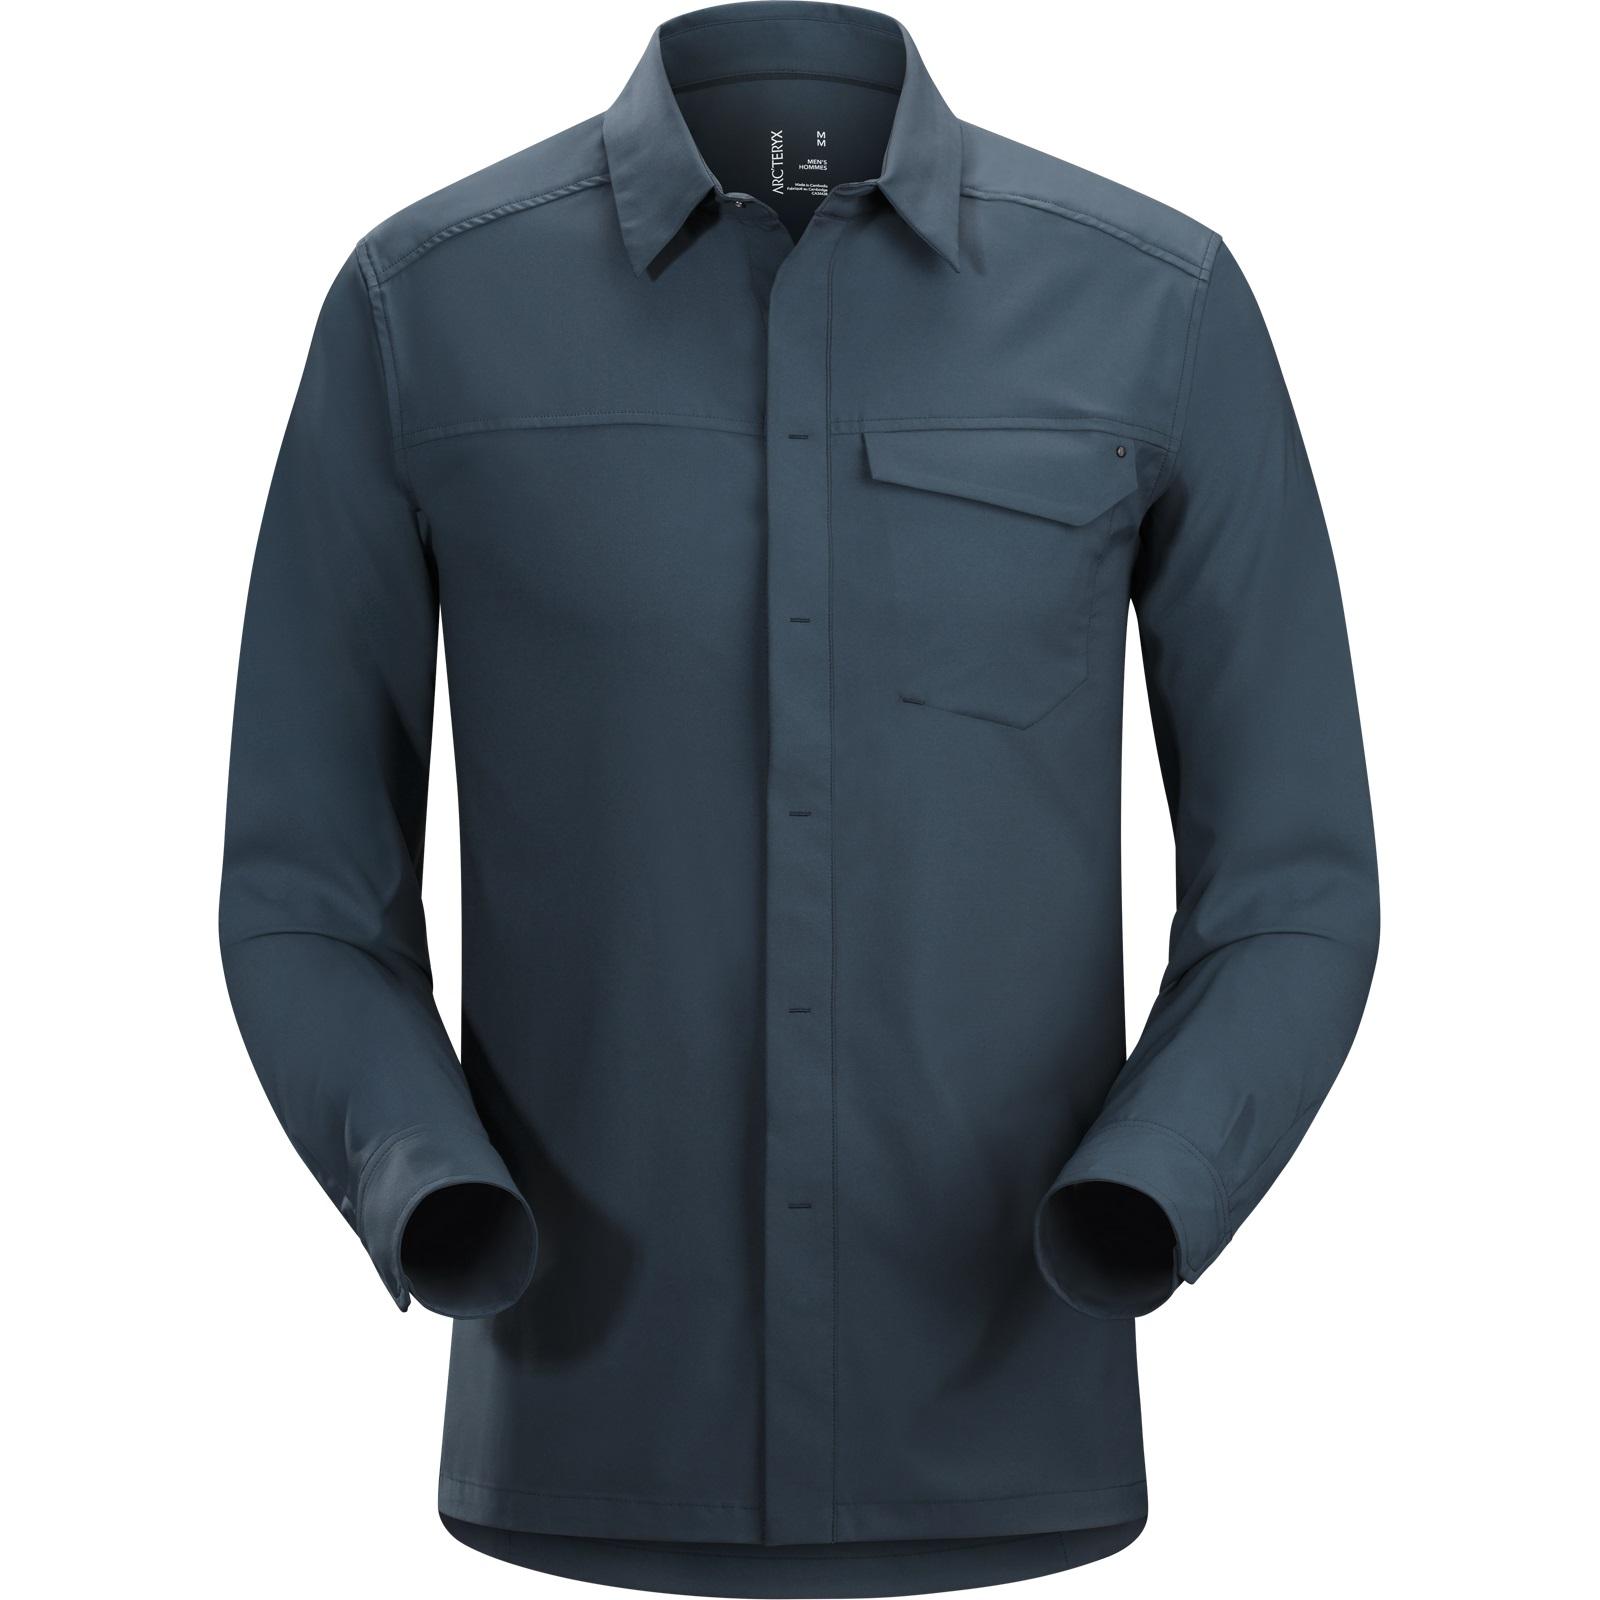 arc-teryx-skyline-ls-shirt-men-s-nighthawk.jpg